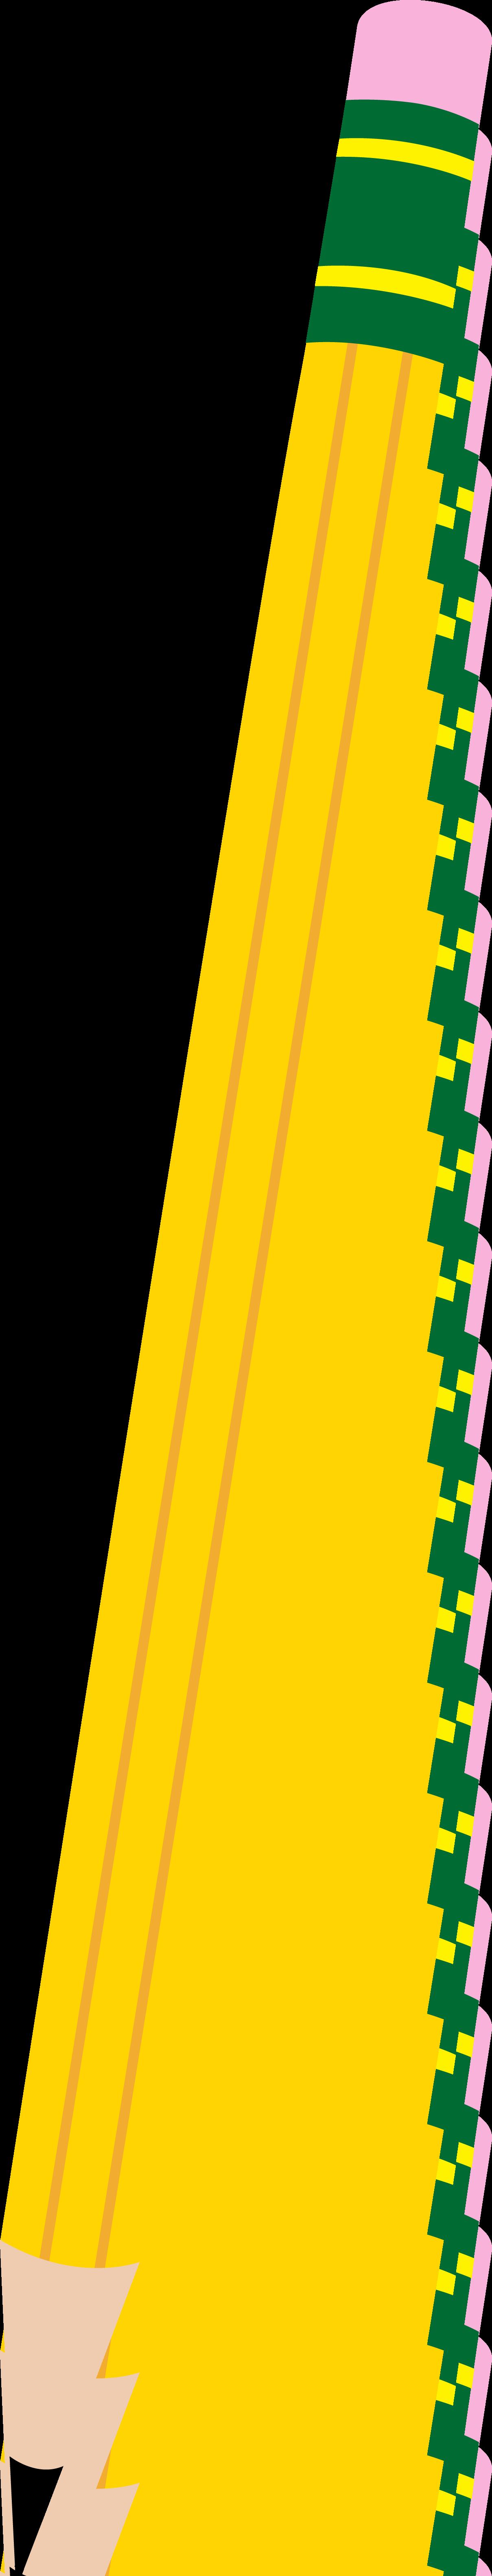 Pencil Clipart Images Horizontal.